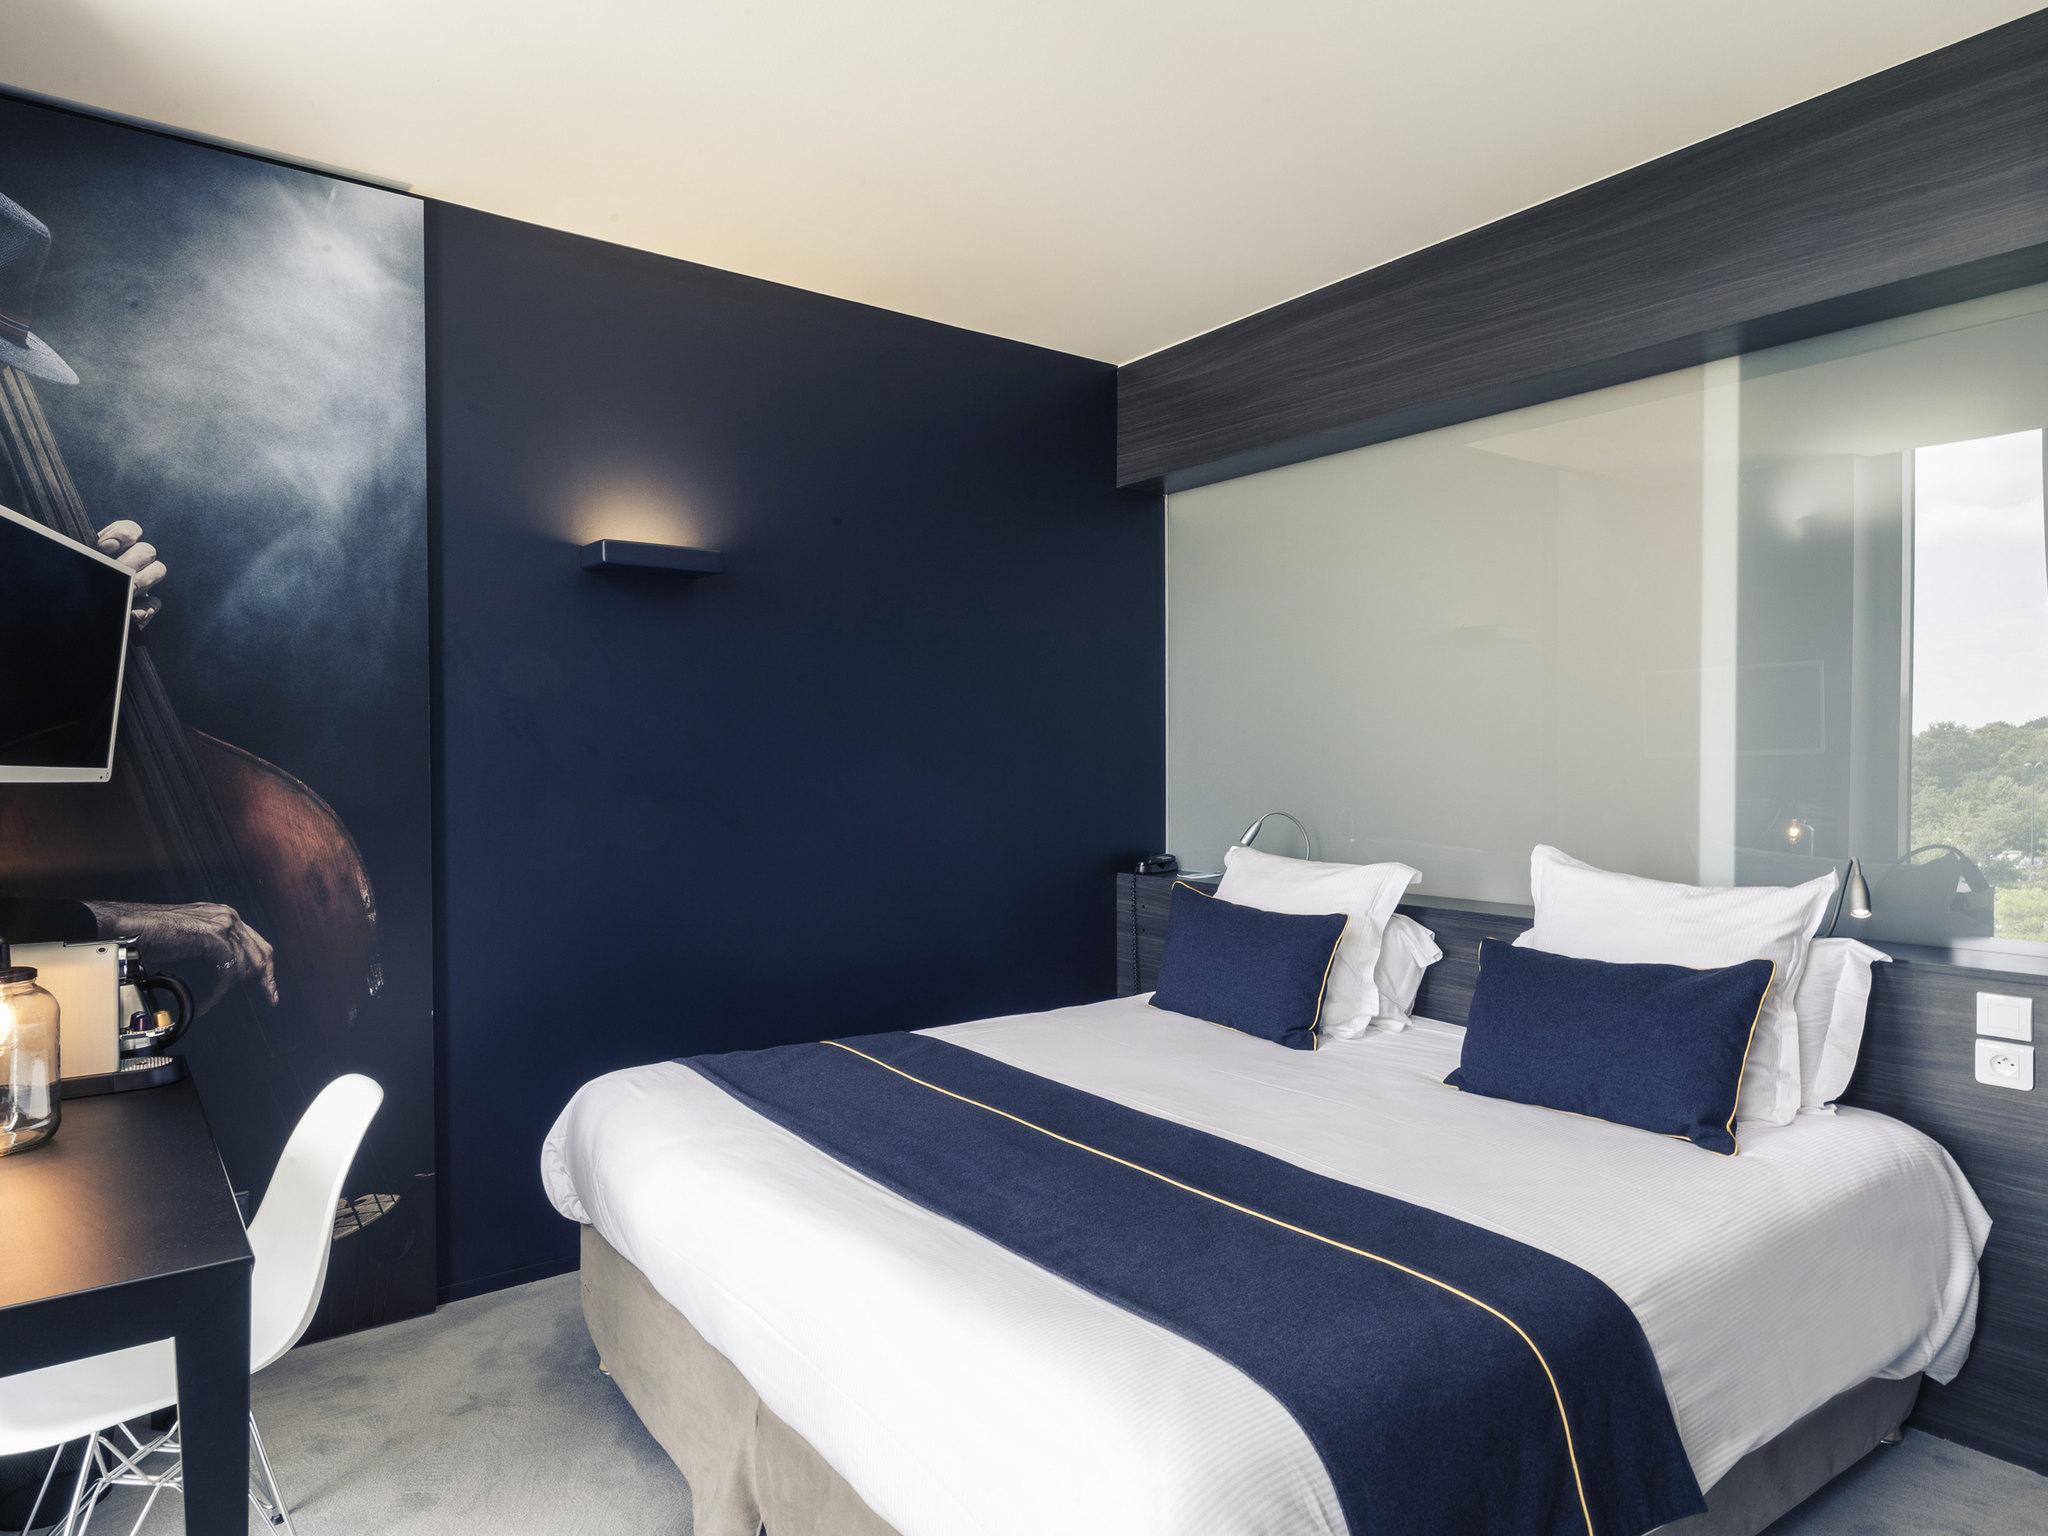 ホテル – Hôtel Mercure Zénith Nantes Saint-Herblain